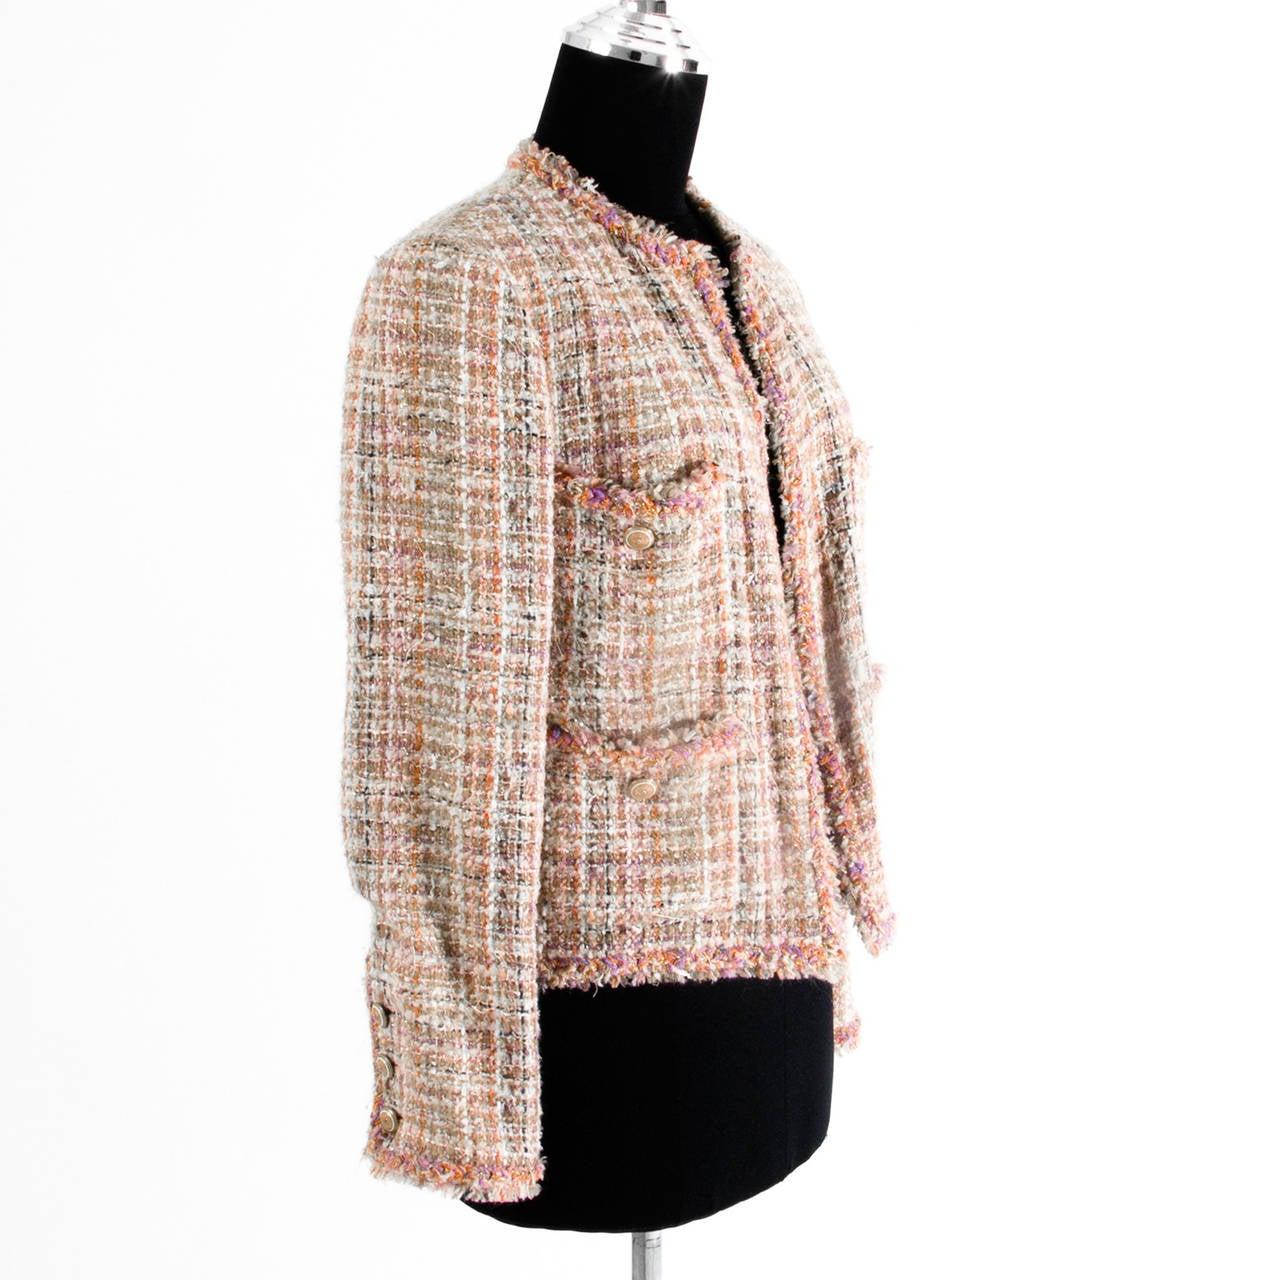 Chanel Pastel Tweed Jacket At 1stdibs